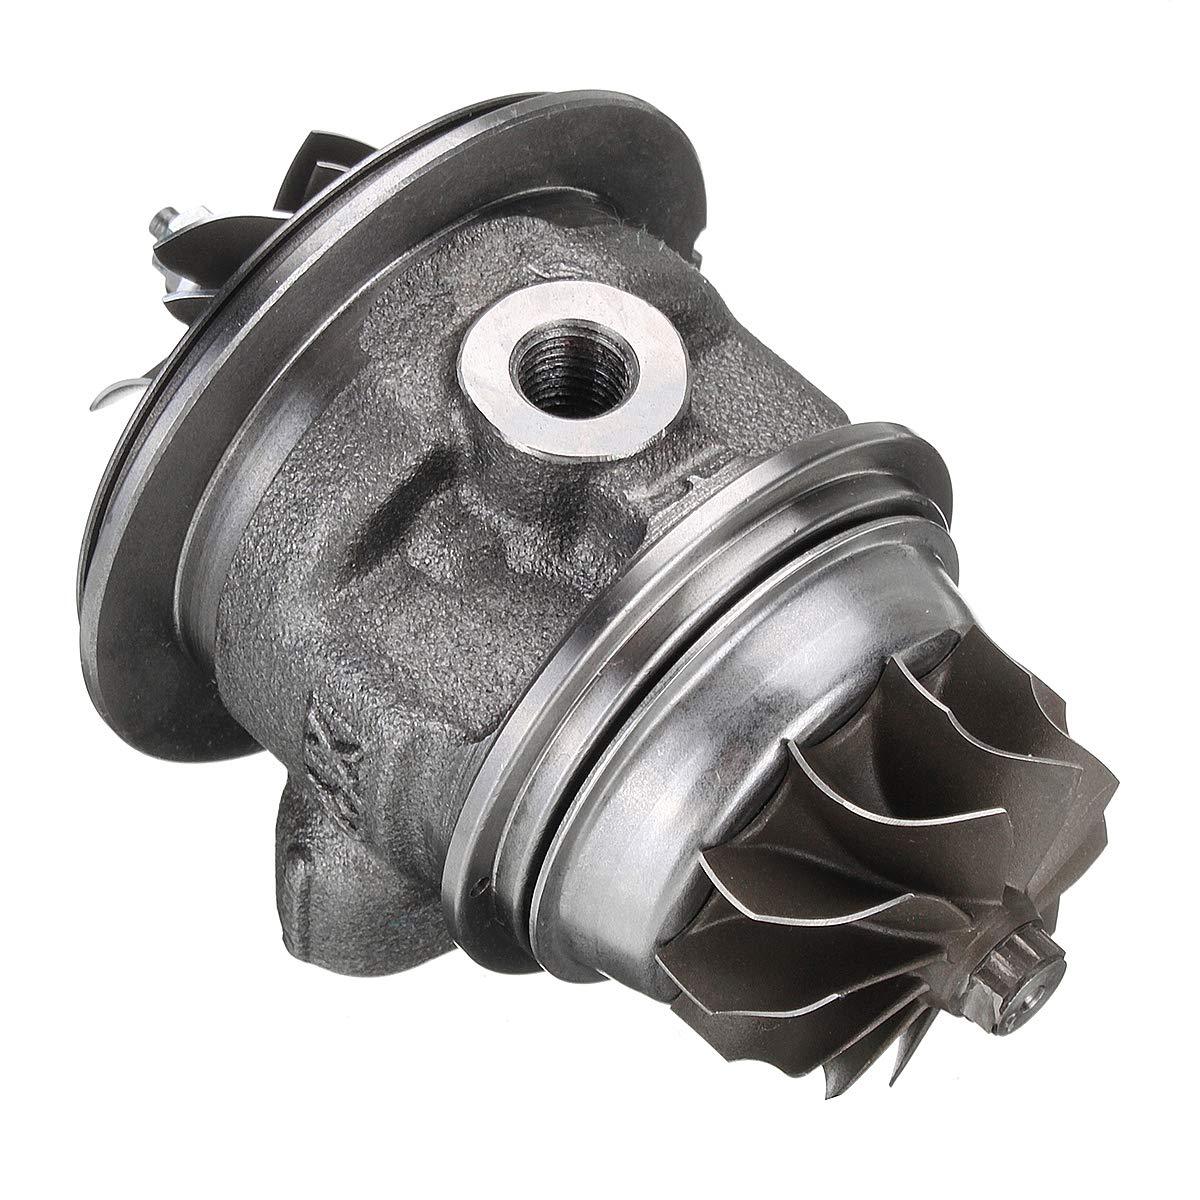 Amazon.com : Pukido Turbocharger Turbo Cartridge Core for Citroen 1.6 HDI 90BHP TD025 : Sports & Outdoors